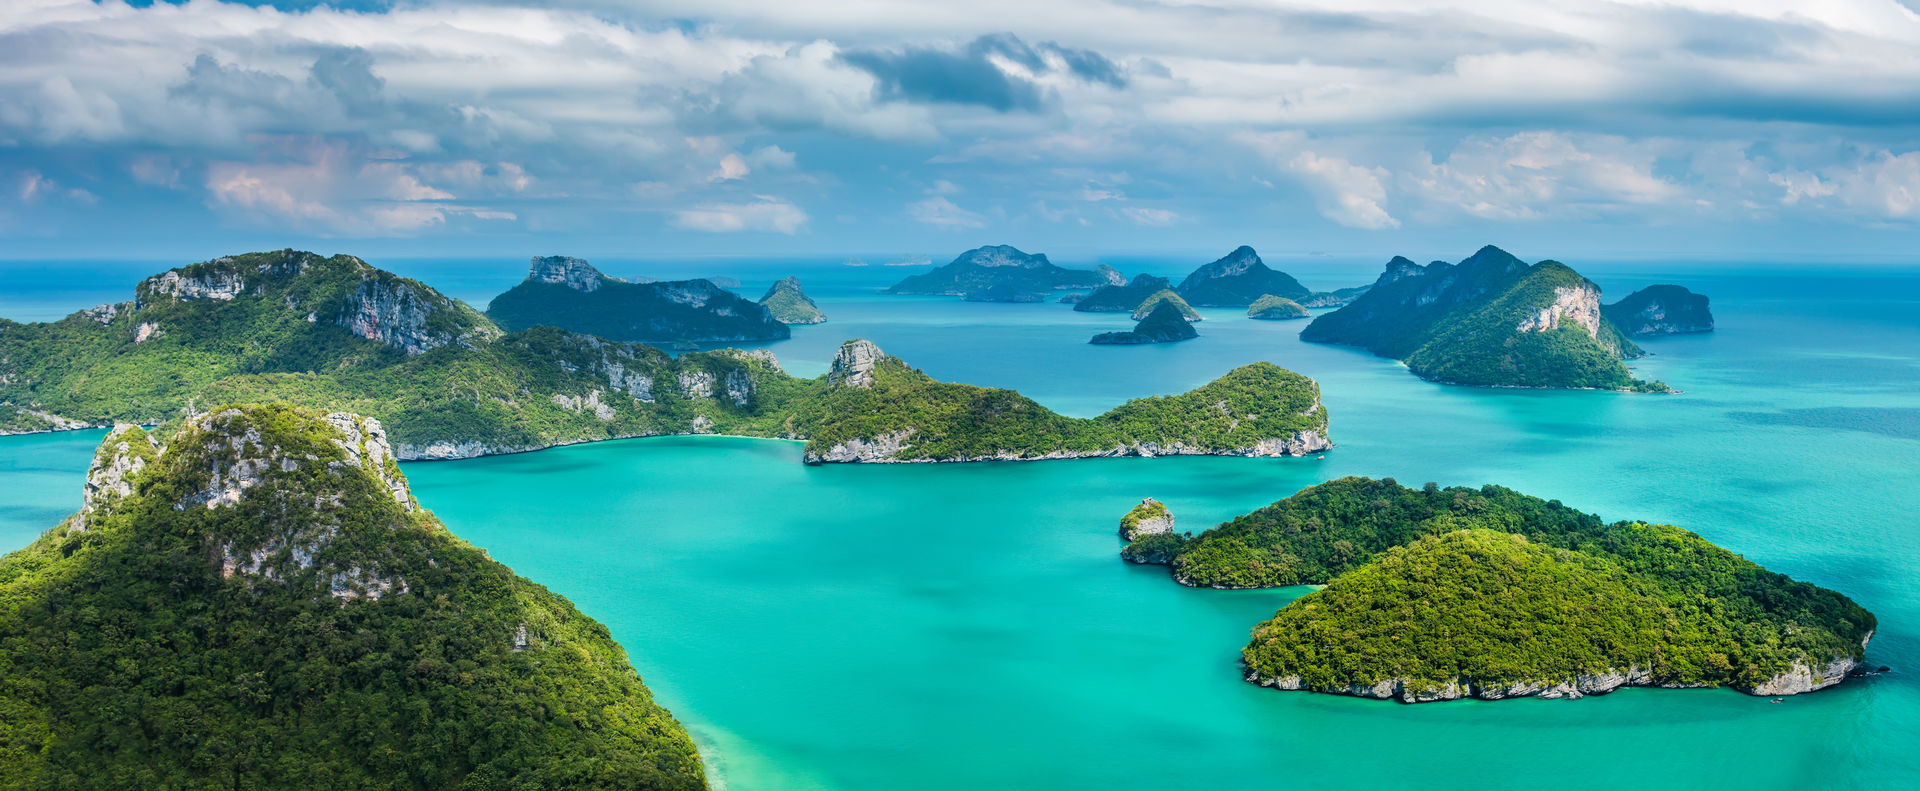 thailande-azurexpat